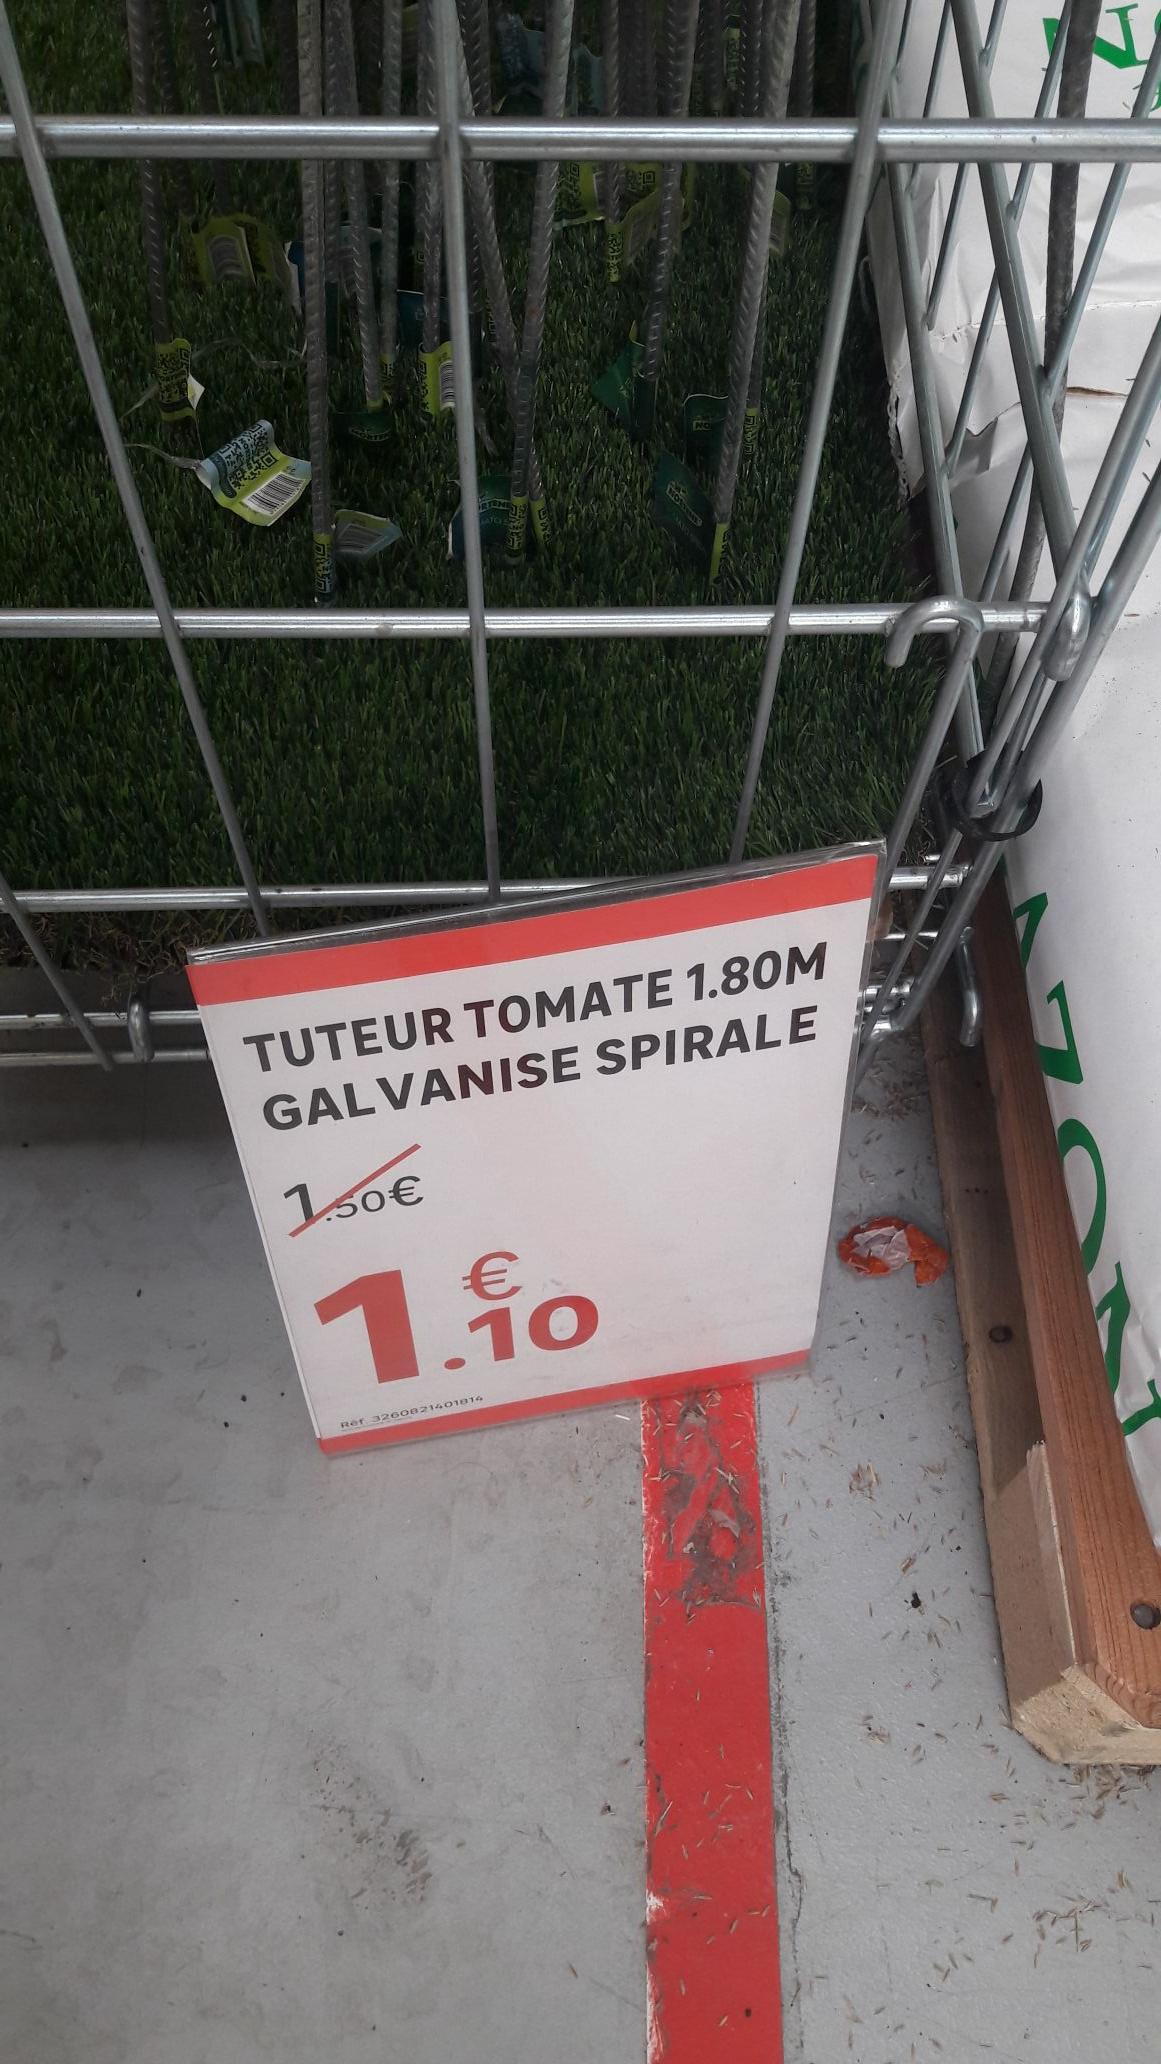 Tuteur tomate galvanisé spitale 1,8m - Leroy Merlin de Canejan (33)